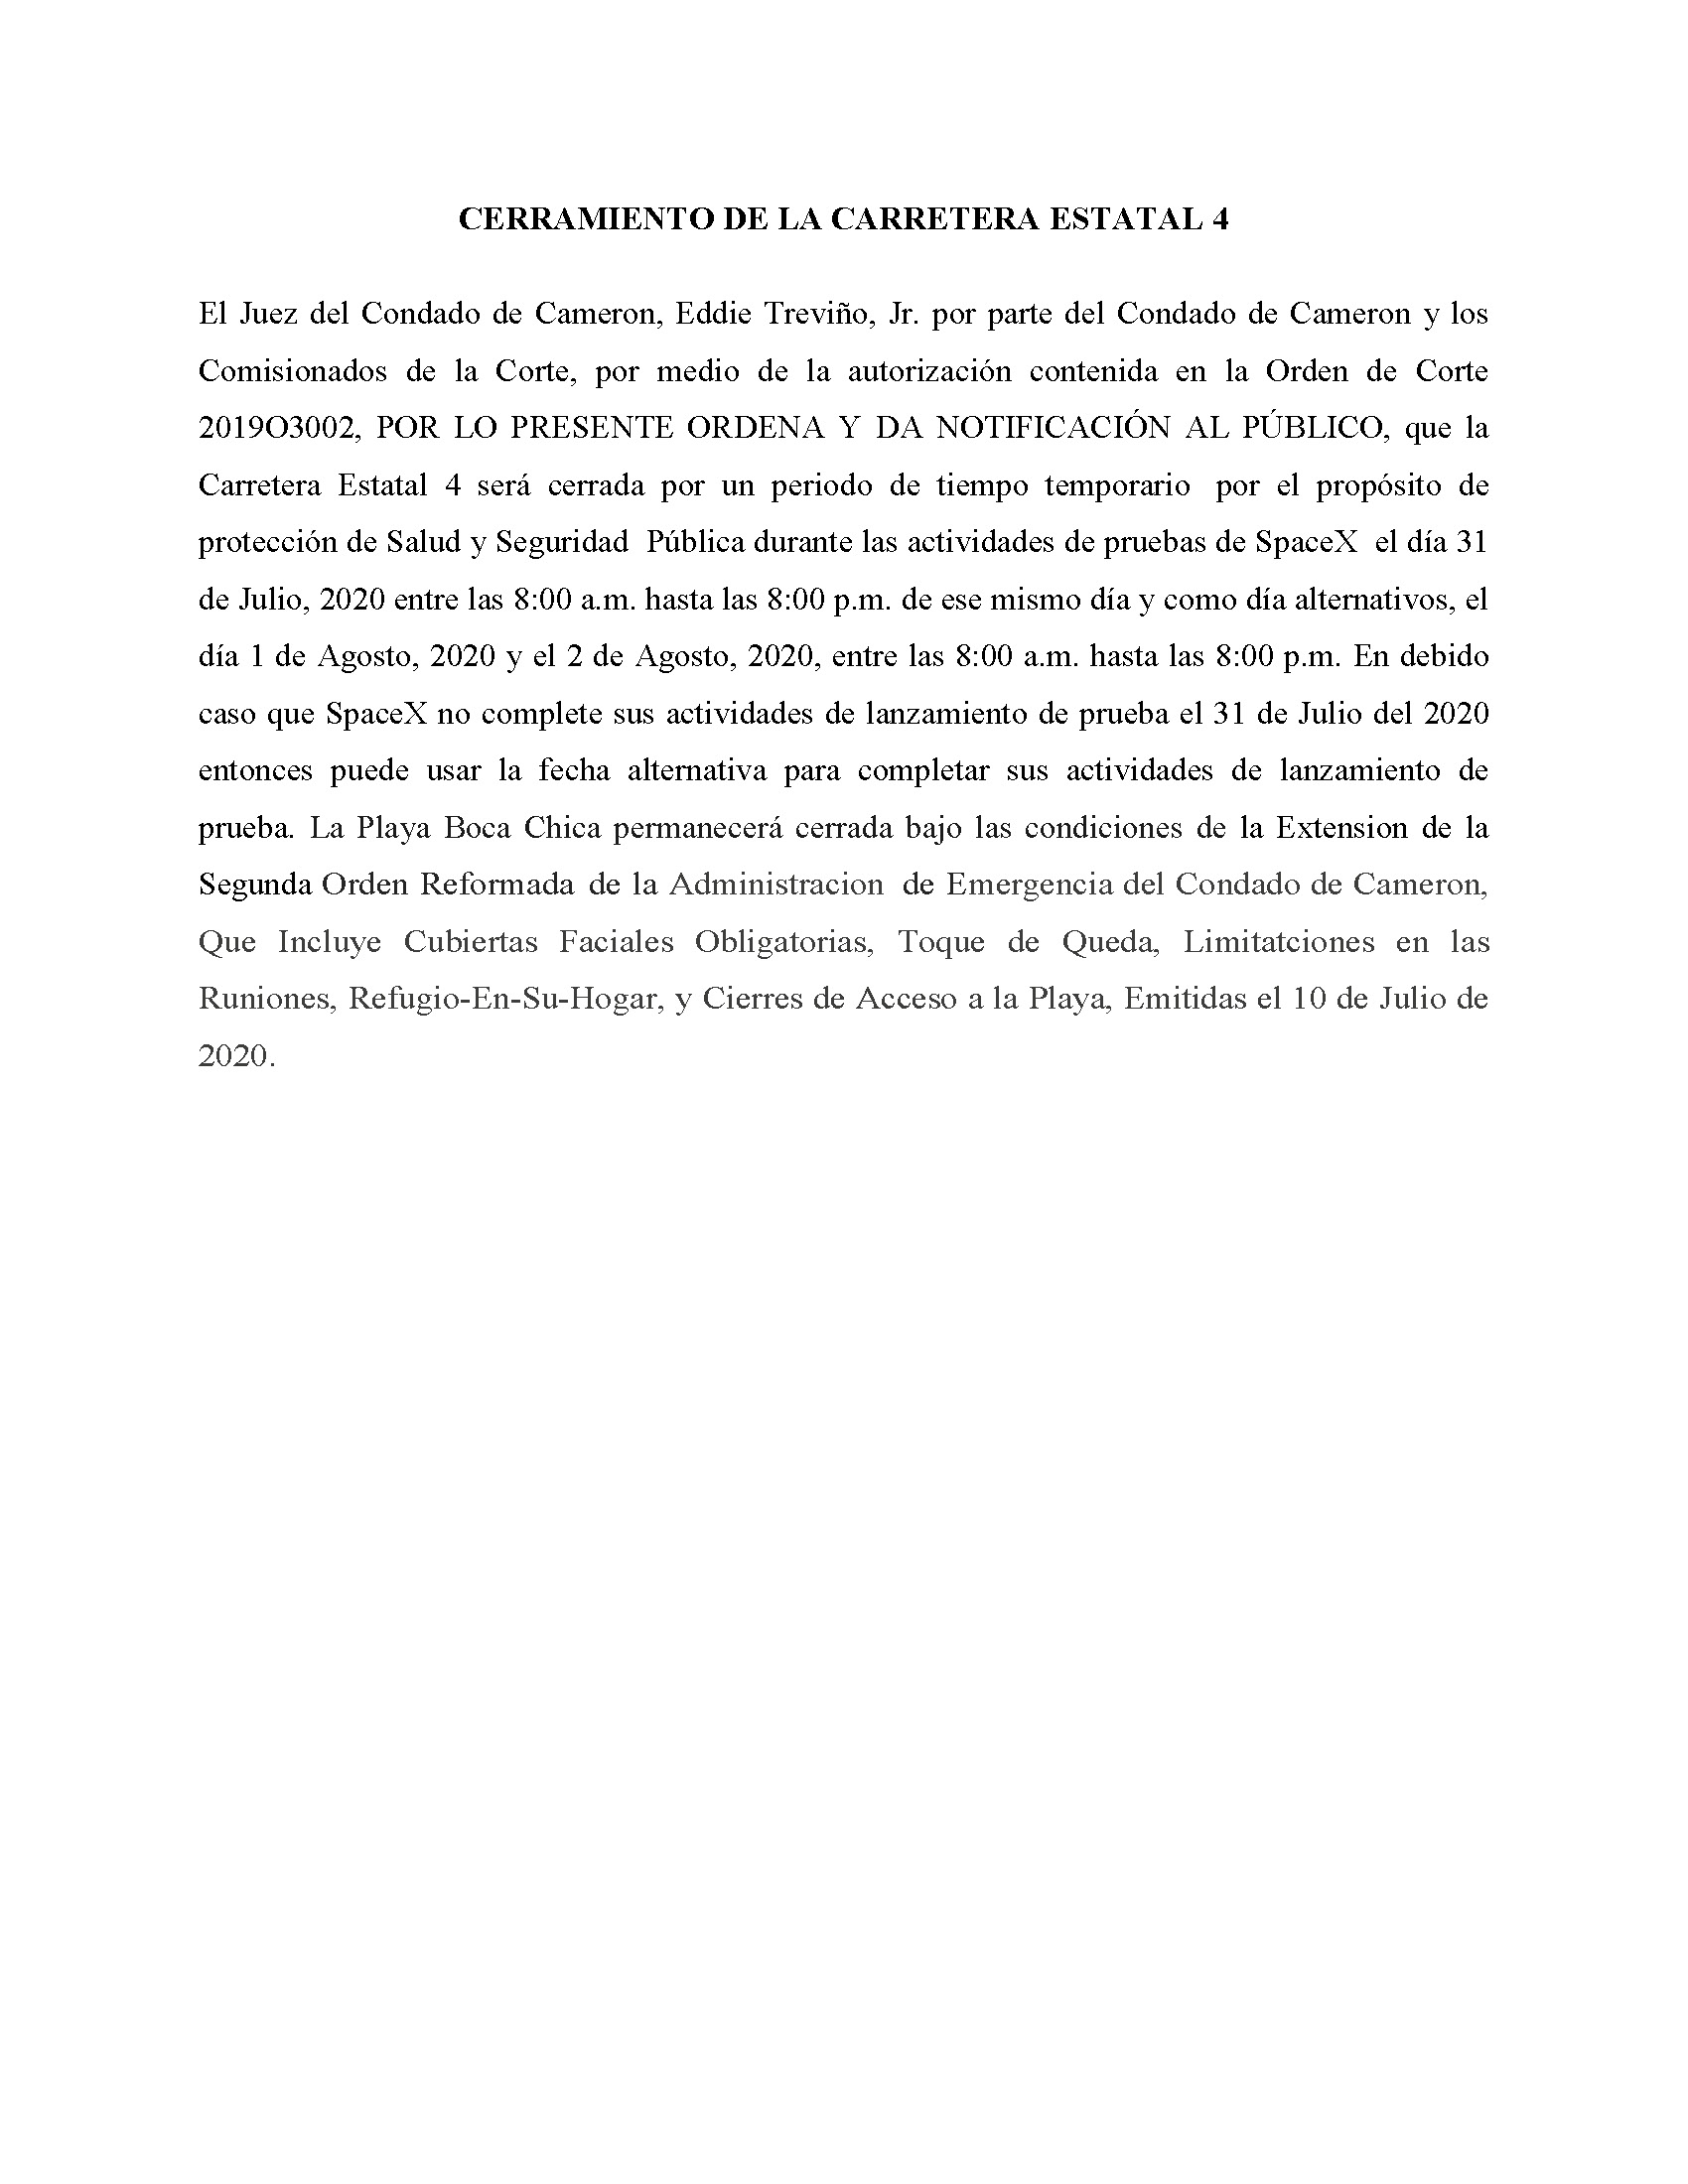 ORDER.CLOSURE OF HIGHWAY 4.SPANISH.07.31.20